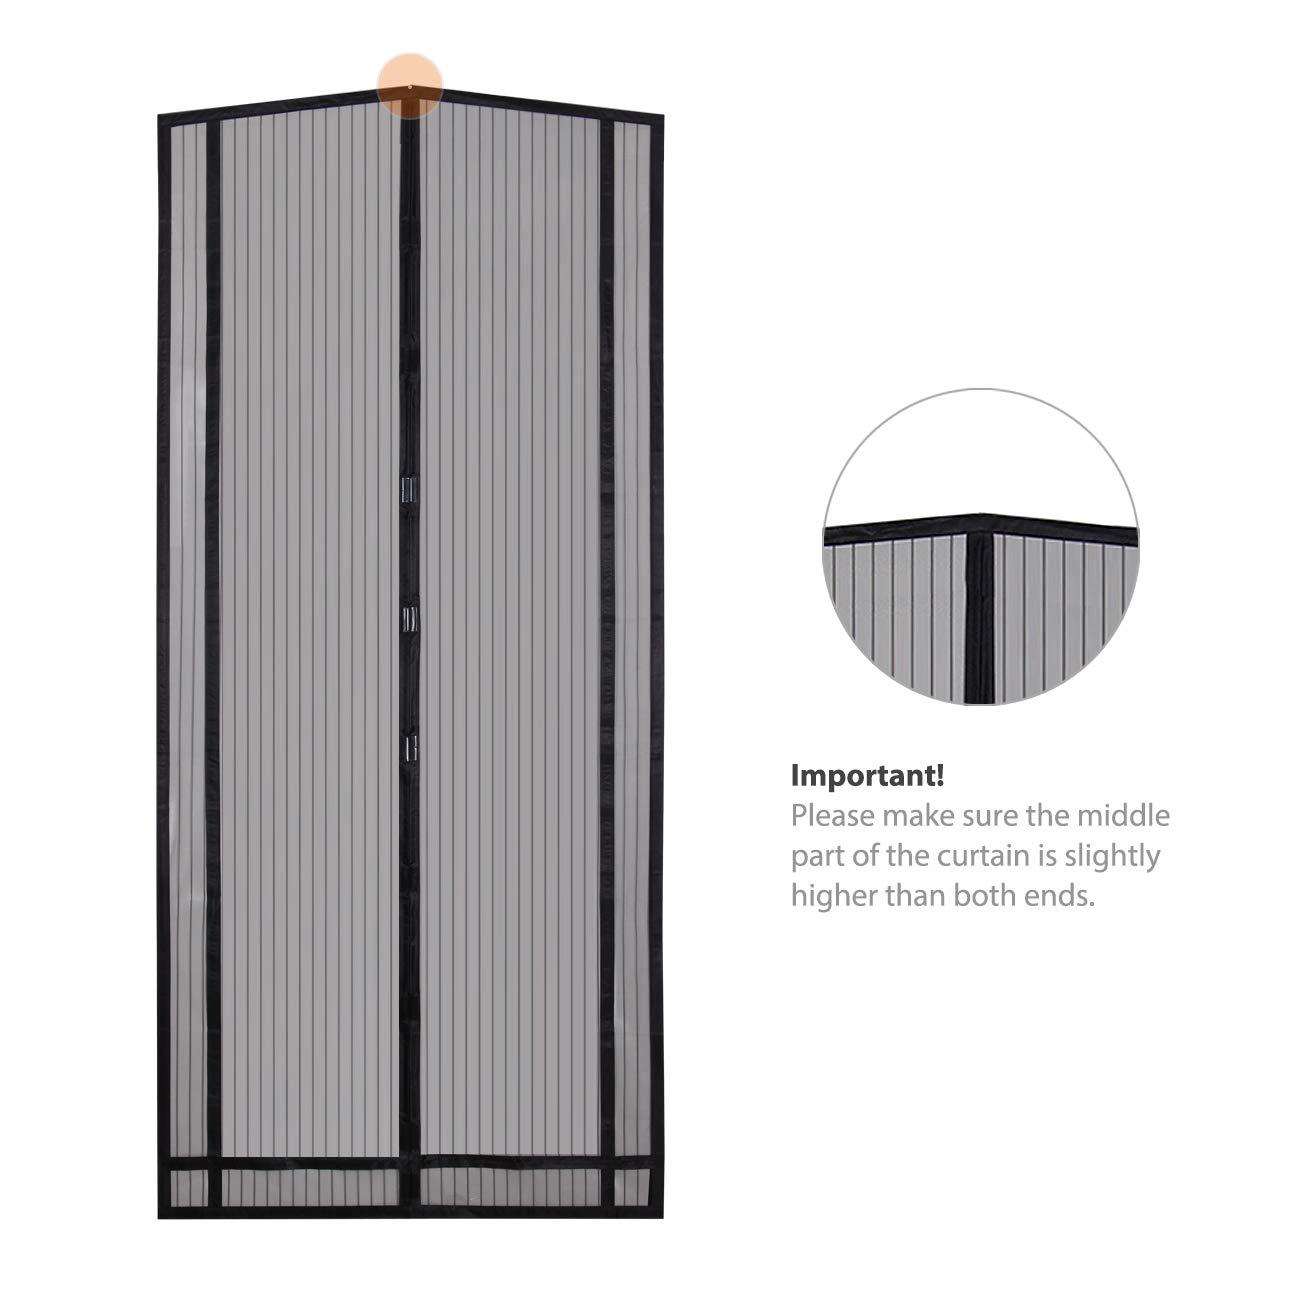 ideal para puerta de balc/ón negro puerta de s/ótano se puede cortar en altura y ancho Sekey 2pcs 220 * 100cm Cortina magn/ética para la protecci/ón contra insectos puerta de terraza